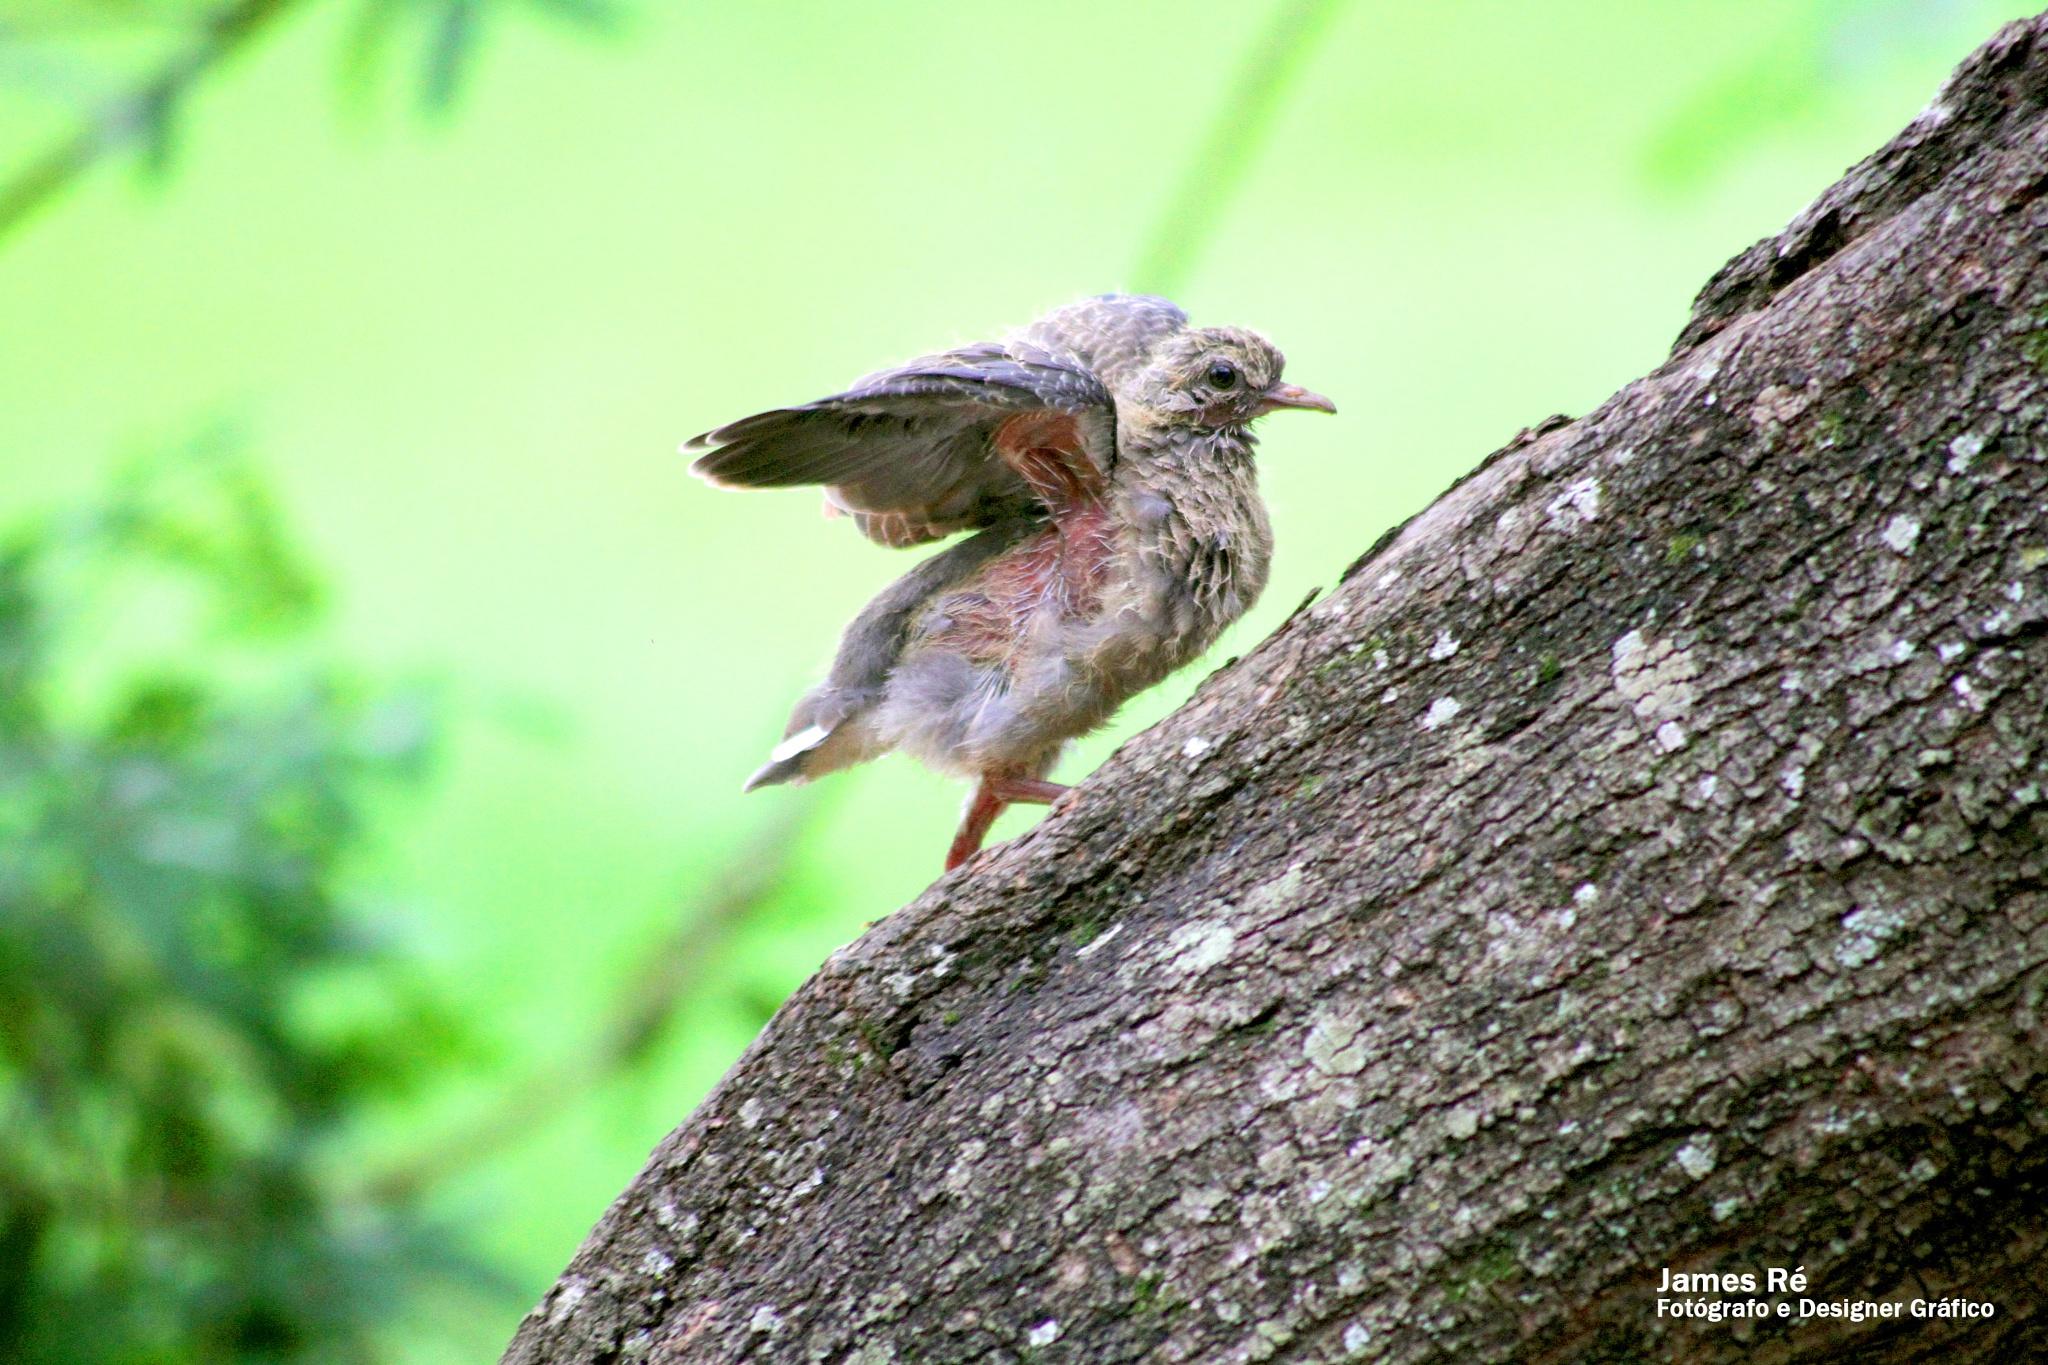 Baby Bird by James Ronaldo Ré